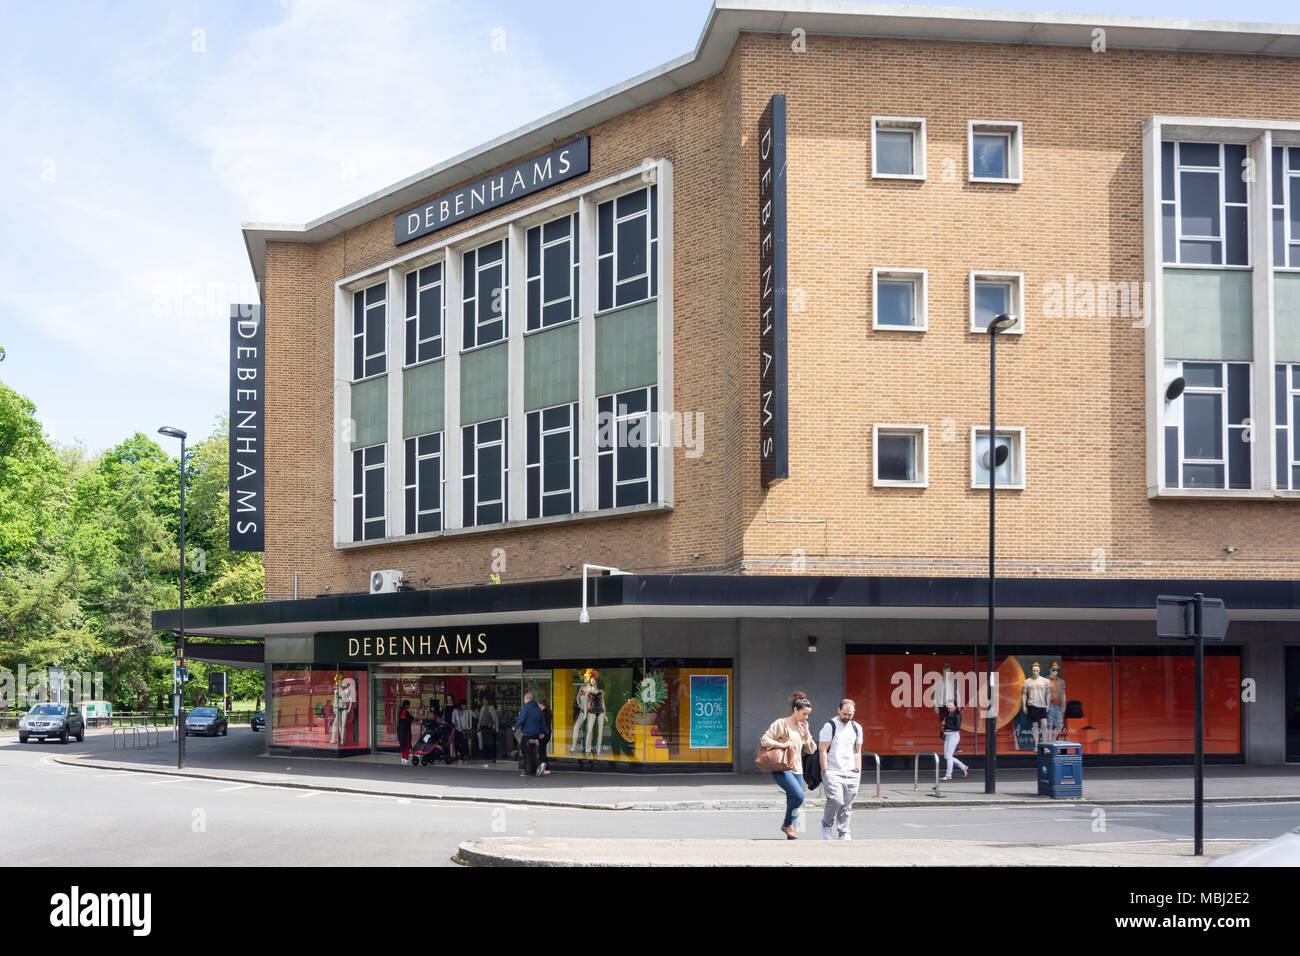 Debenhams department store, Queens Buildings, Queensway, Southampton, Hampshire, England, United Kingdom - Stock Image